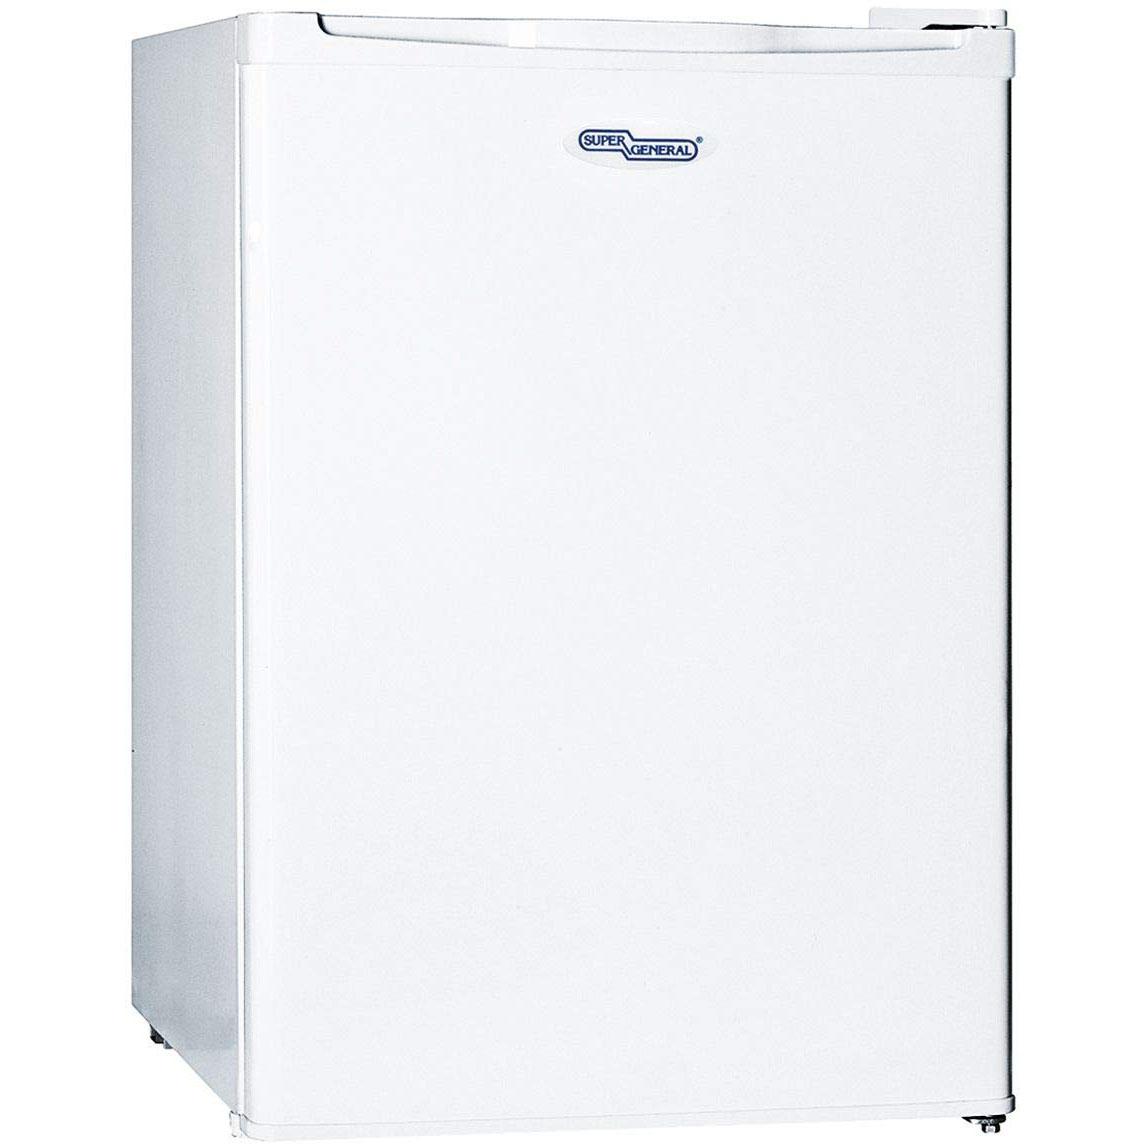 Super General SGR045-H Single Door Refrigerator 90L - White